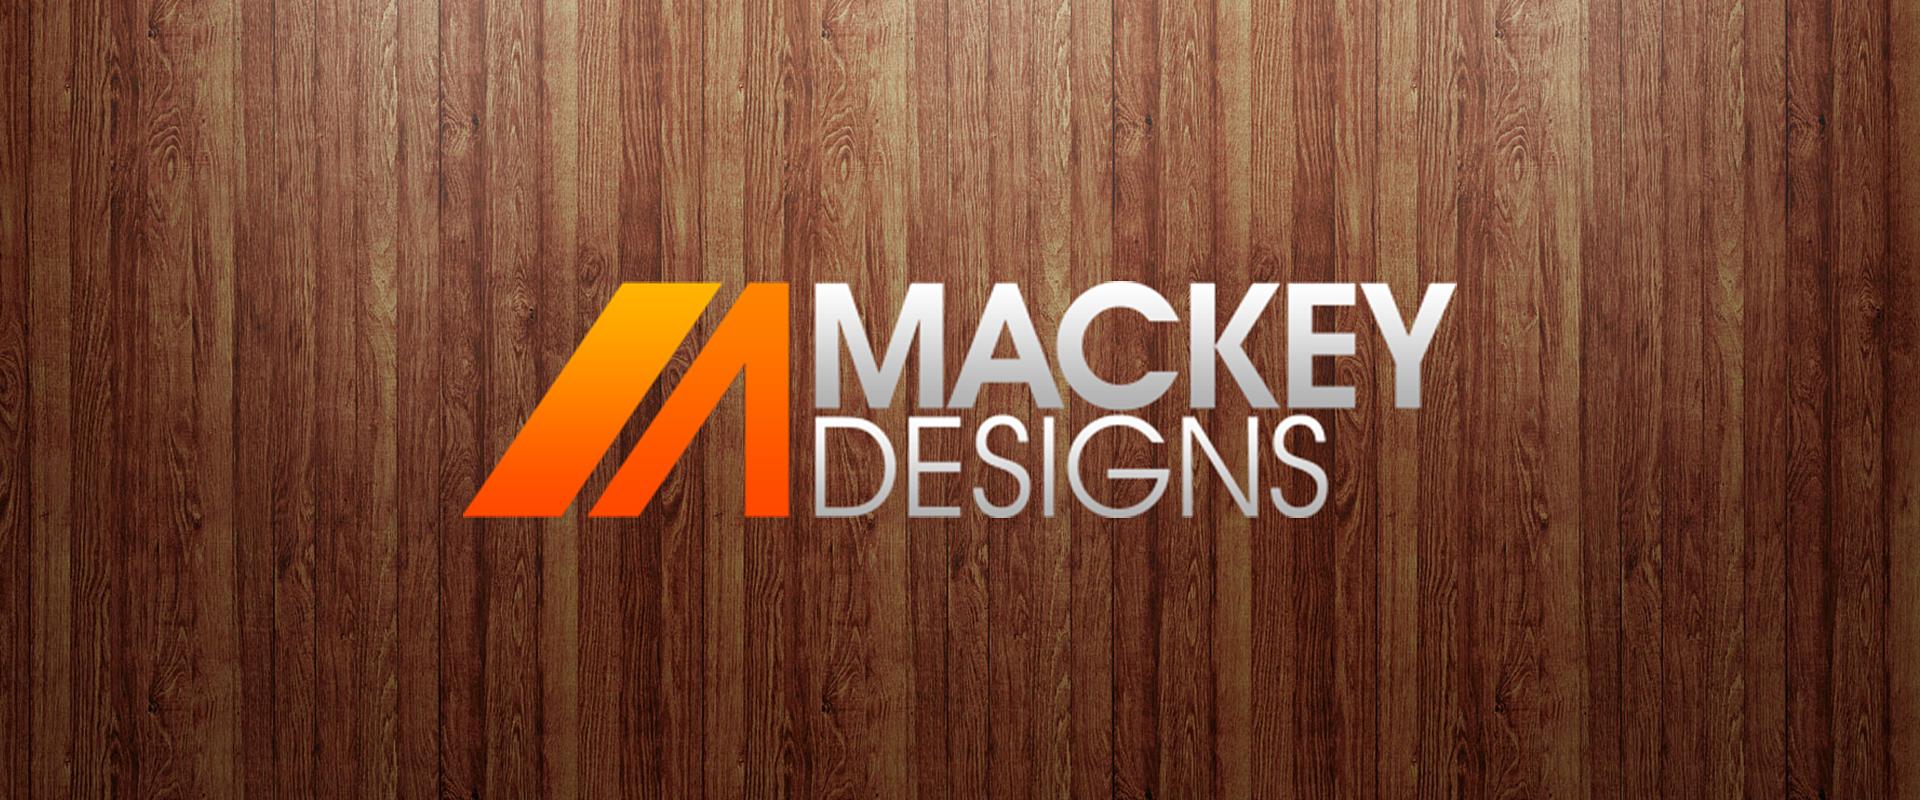 JoshMackey-BrandManagement-mackeydesigns.jpg